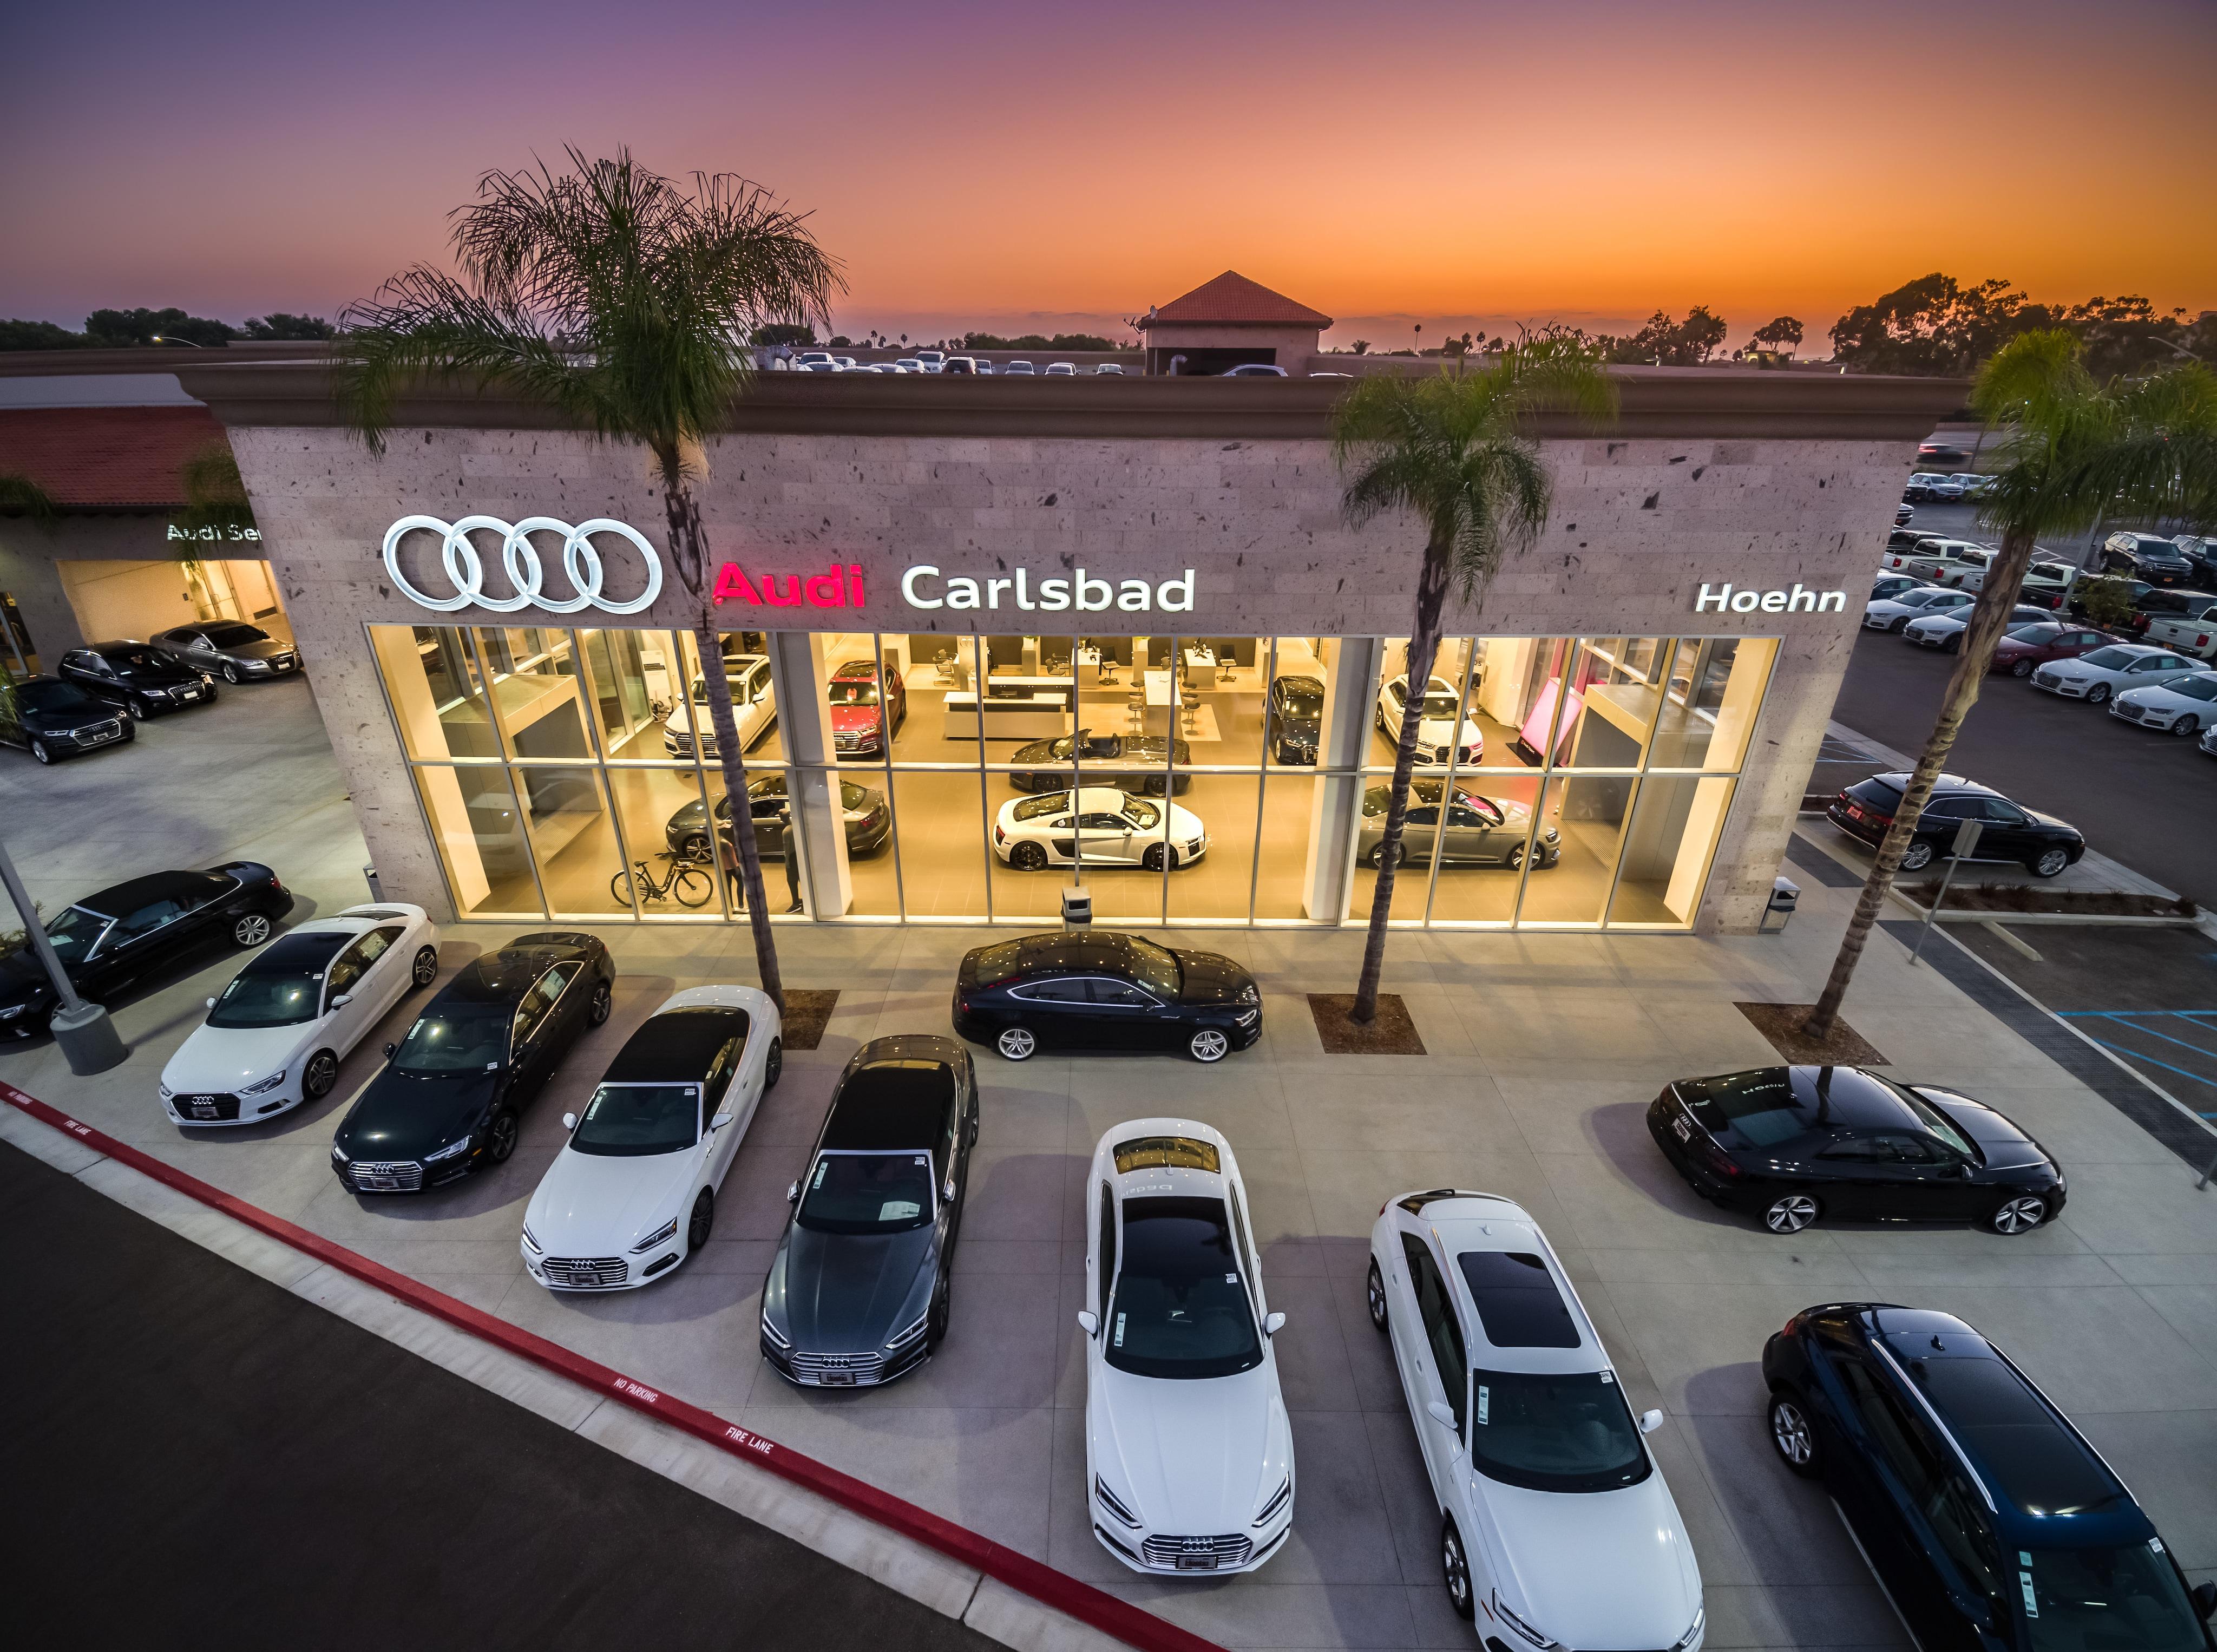 Audi Carlsbad A Hoehn Motors Company New Audi Dealership In - Audi carlsbad